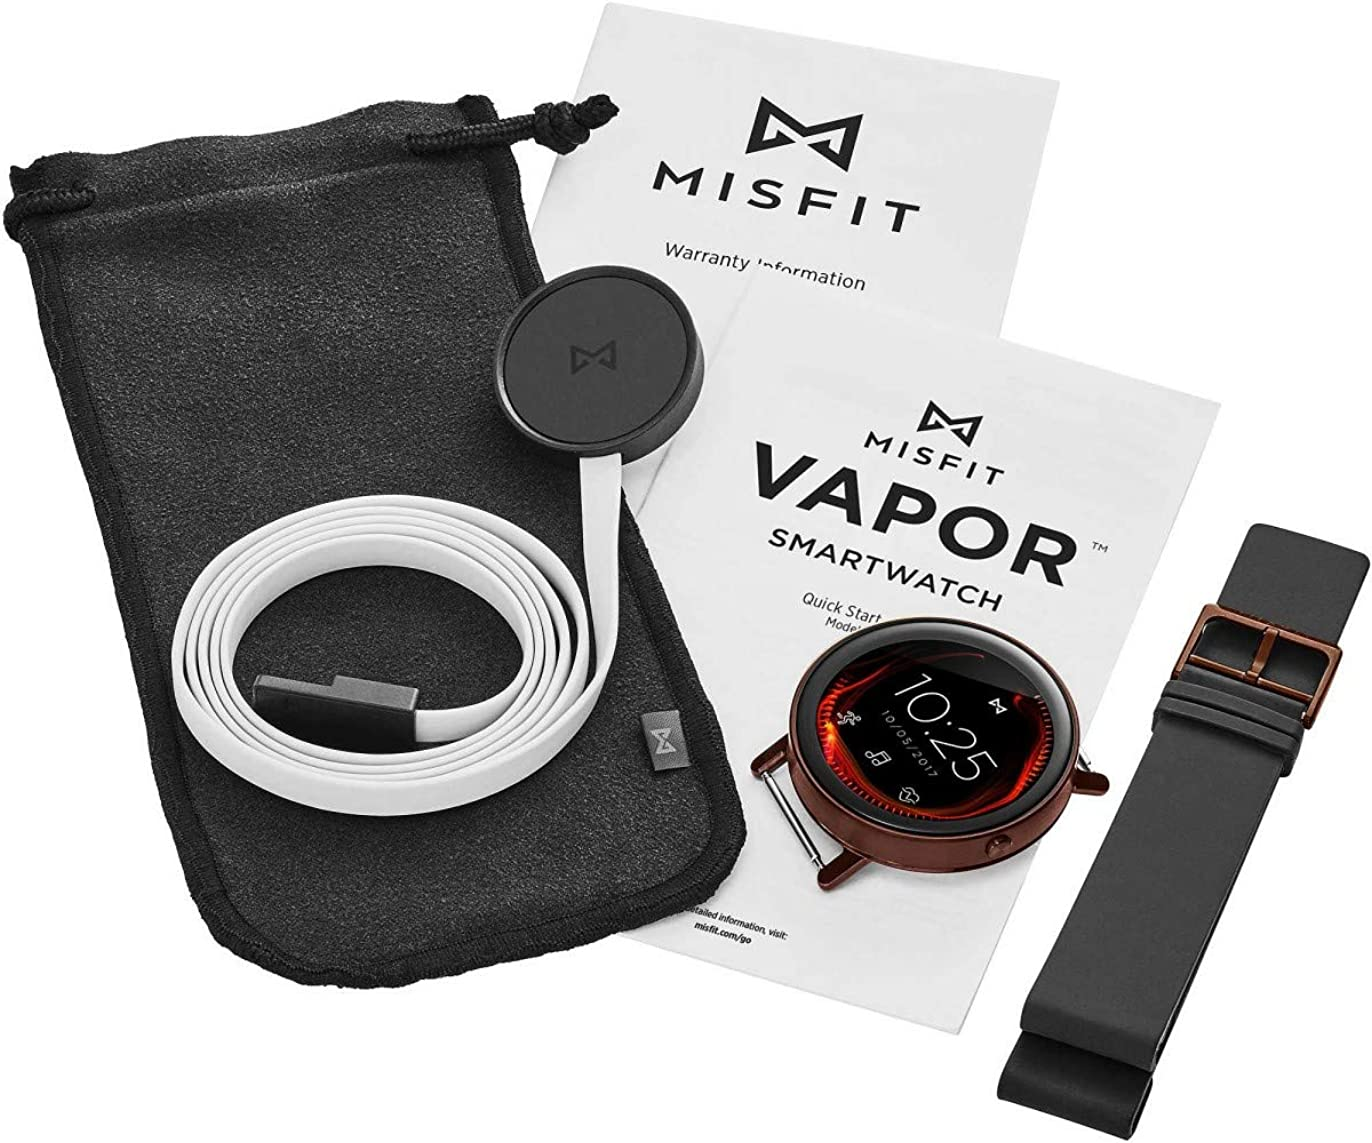 Amazon.com: Misfit MIS7006 Vapor Smartwatch: Watches